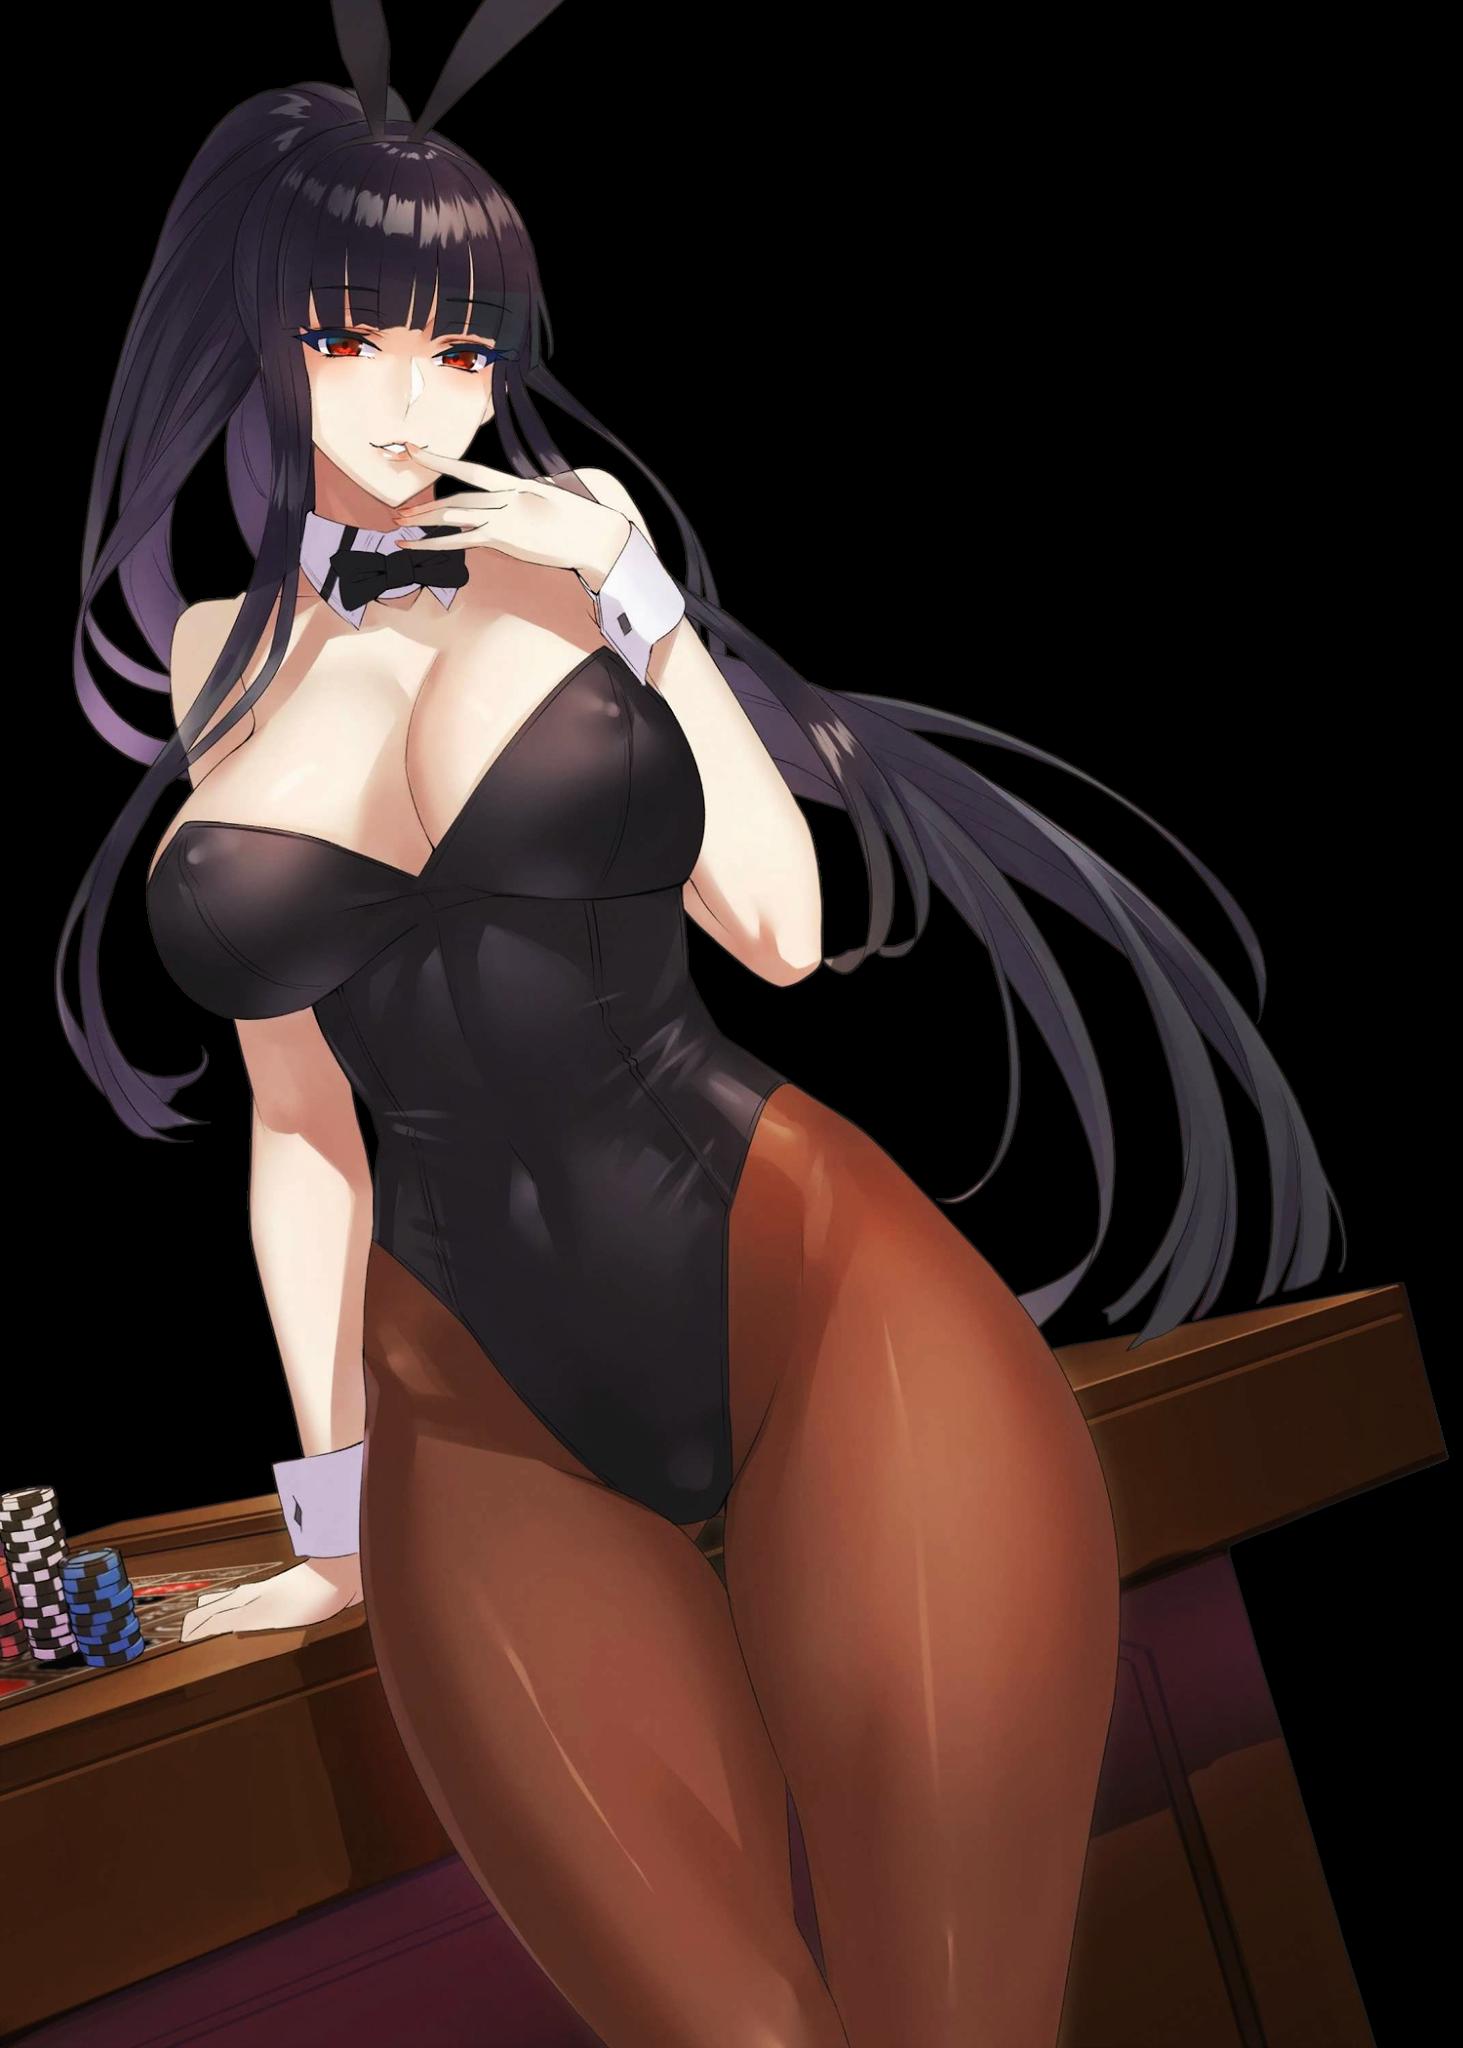 Kakegurui - Jabami Yumeko